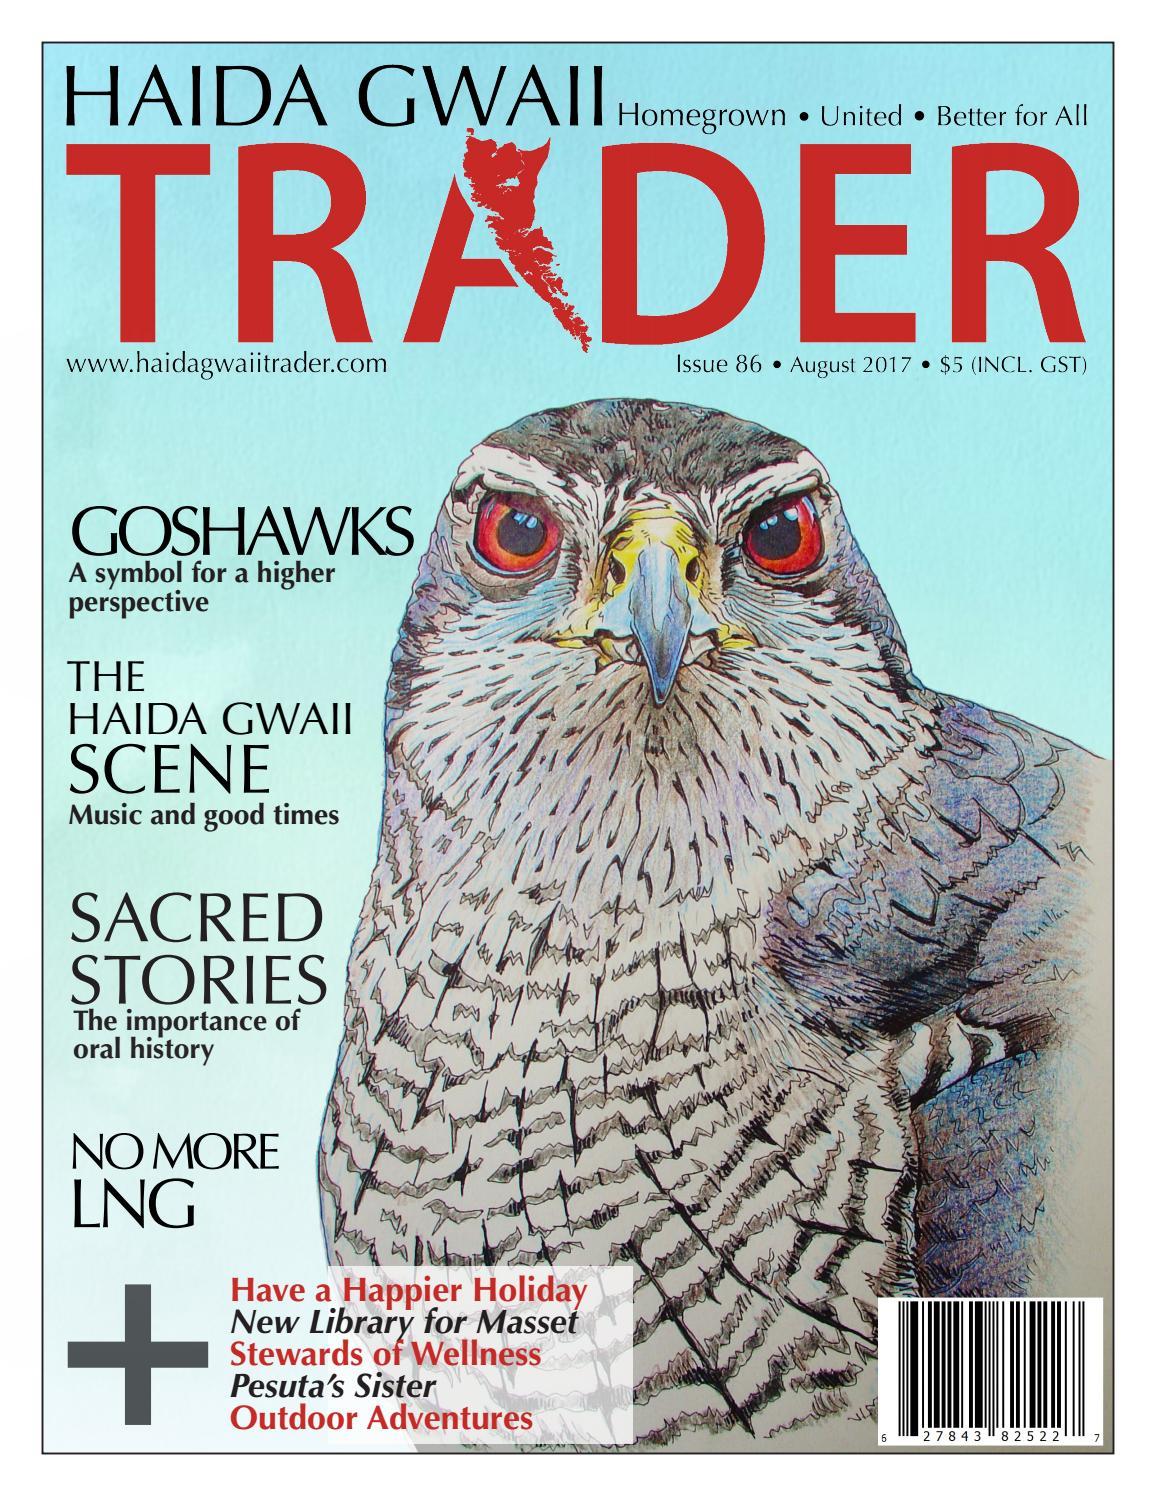 Hgt magazine 86 august 2017 by haida gwaii trader issuu buycottarizona